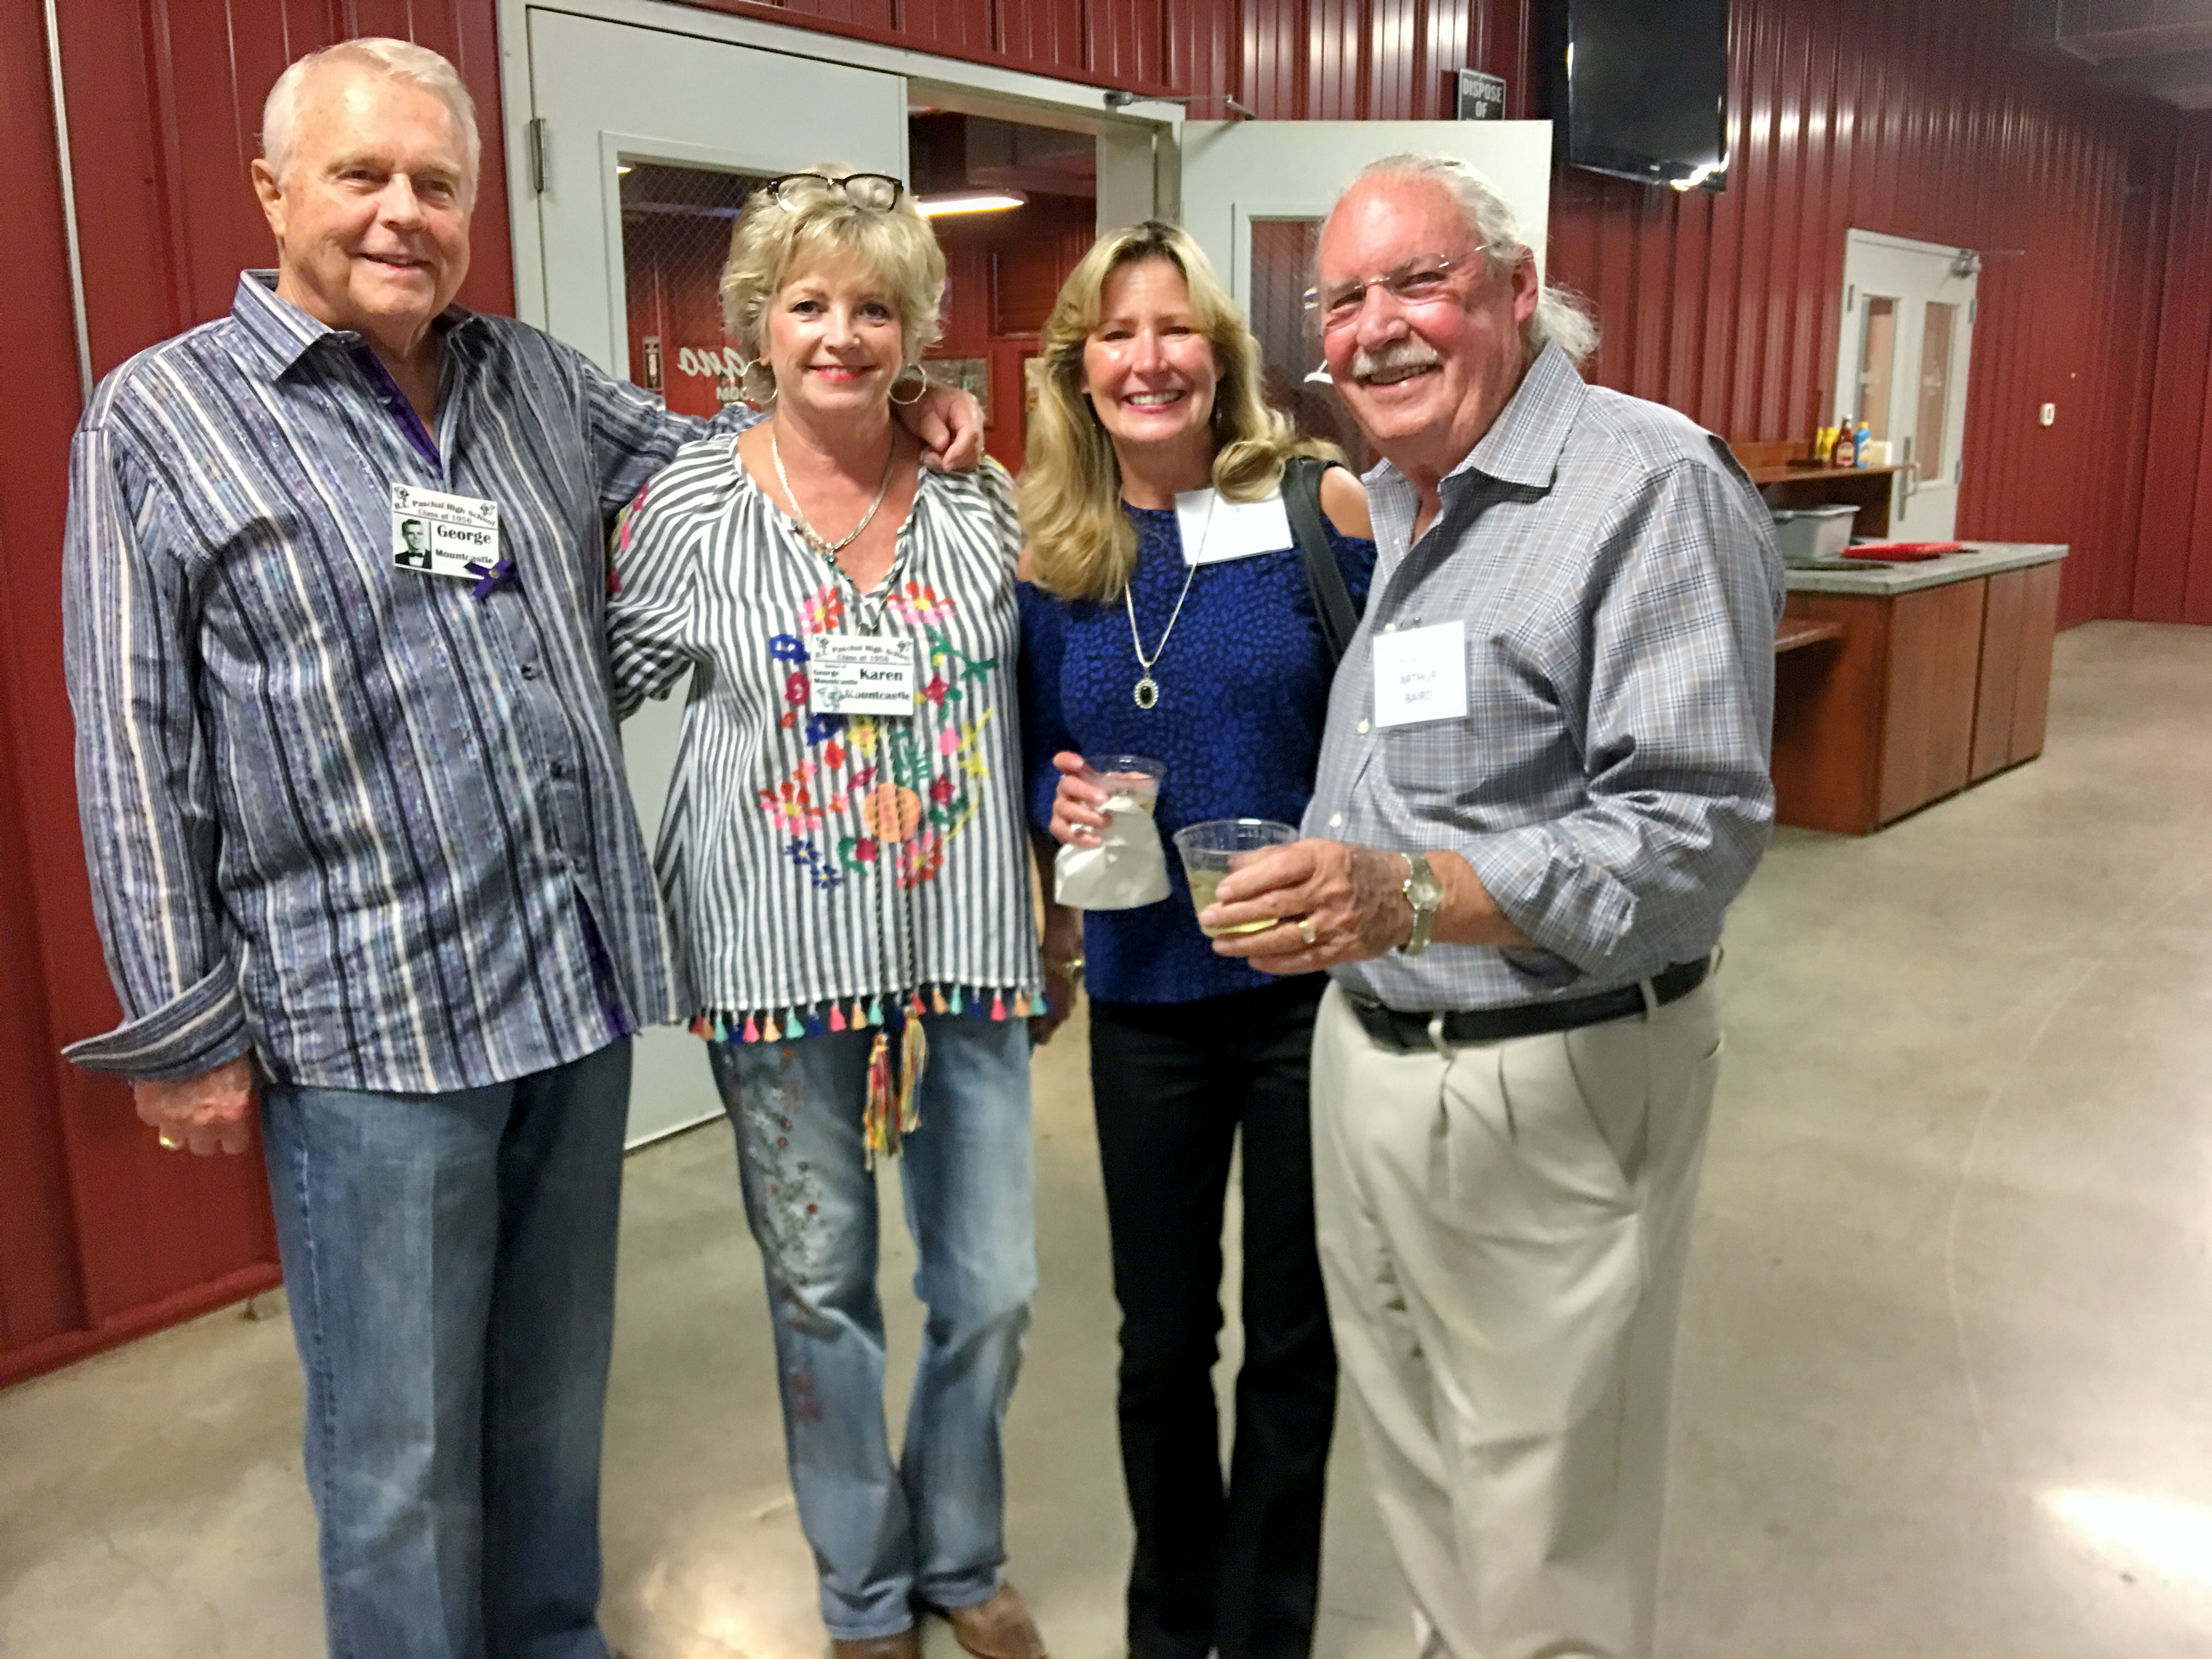 George and Karen Mountcastle, Terri Baird Smalley and Arthur Baird